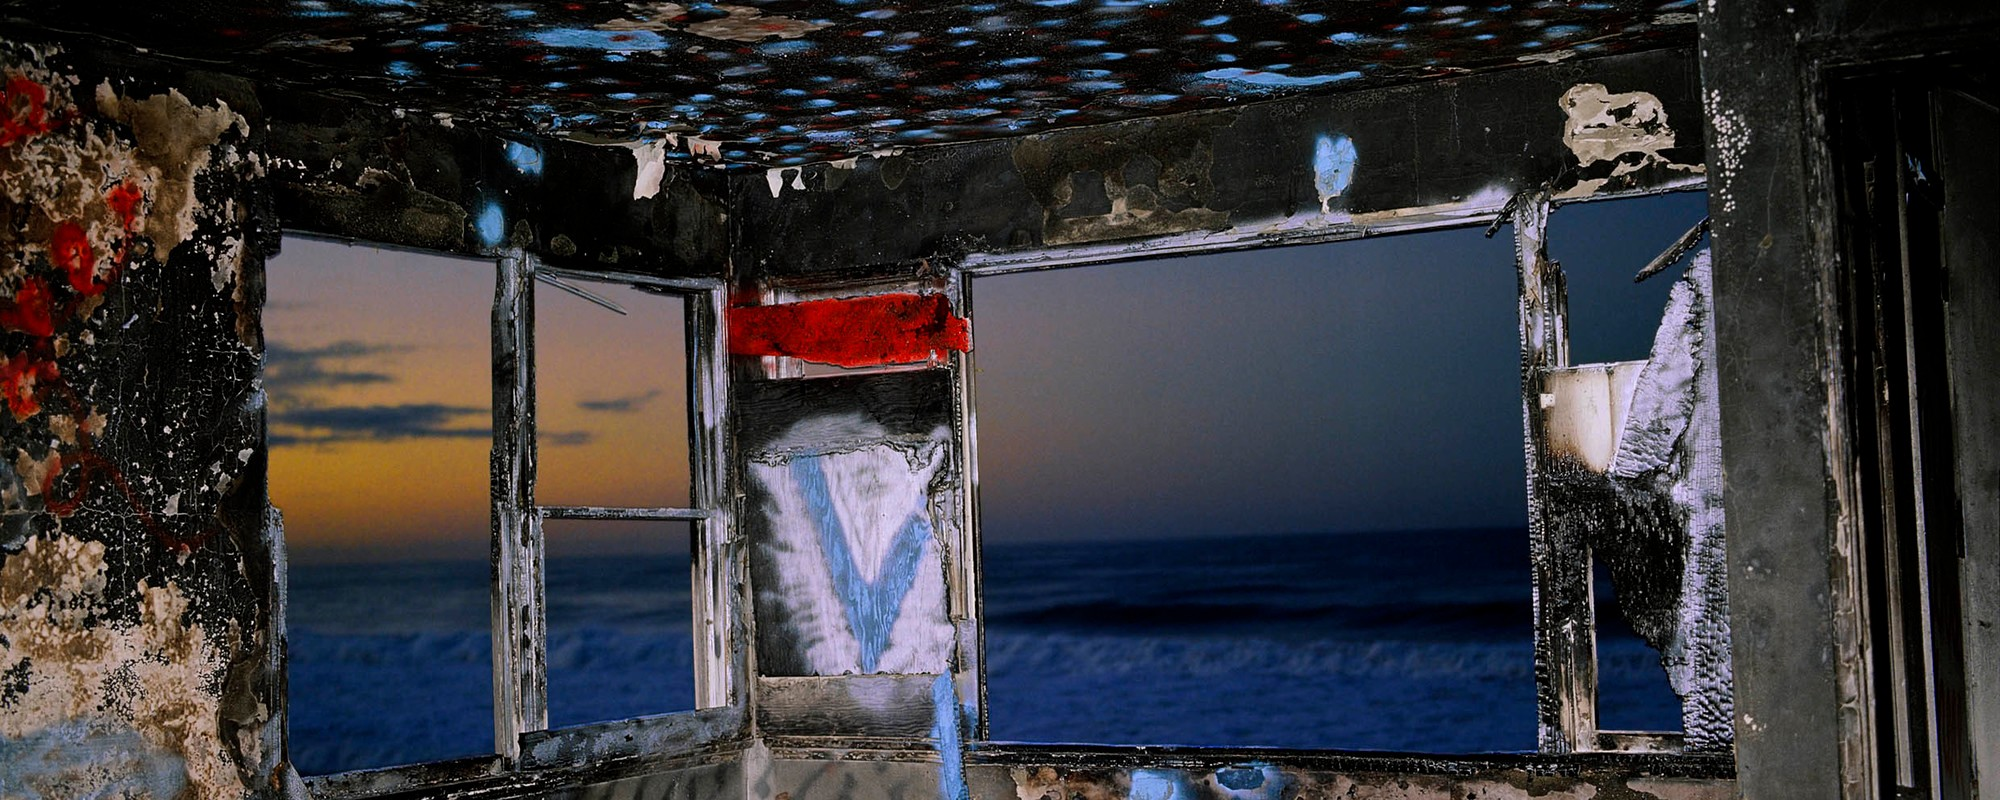 John Divola's Artistic Vandalism Is Still Fresh After 40 Years